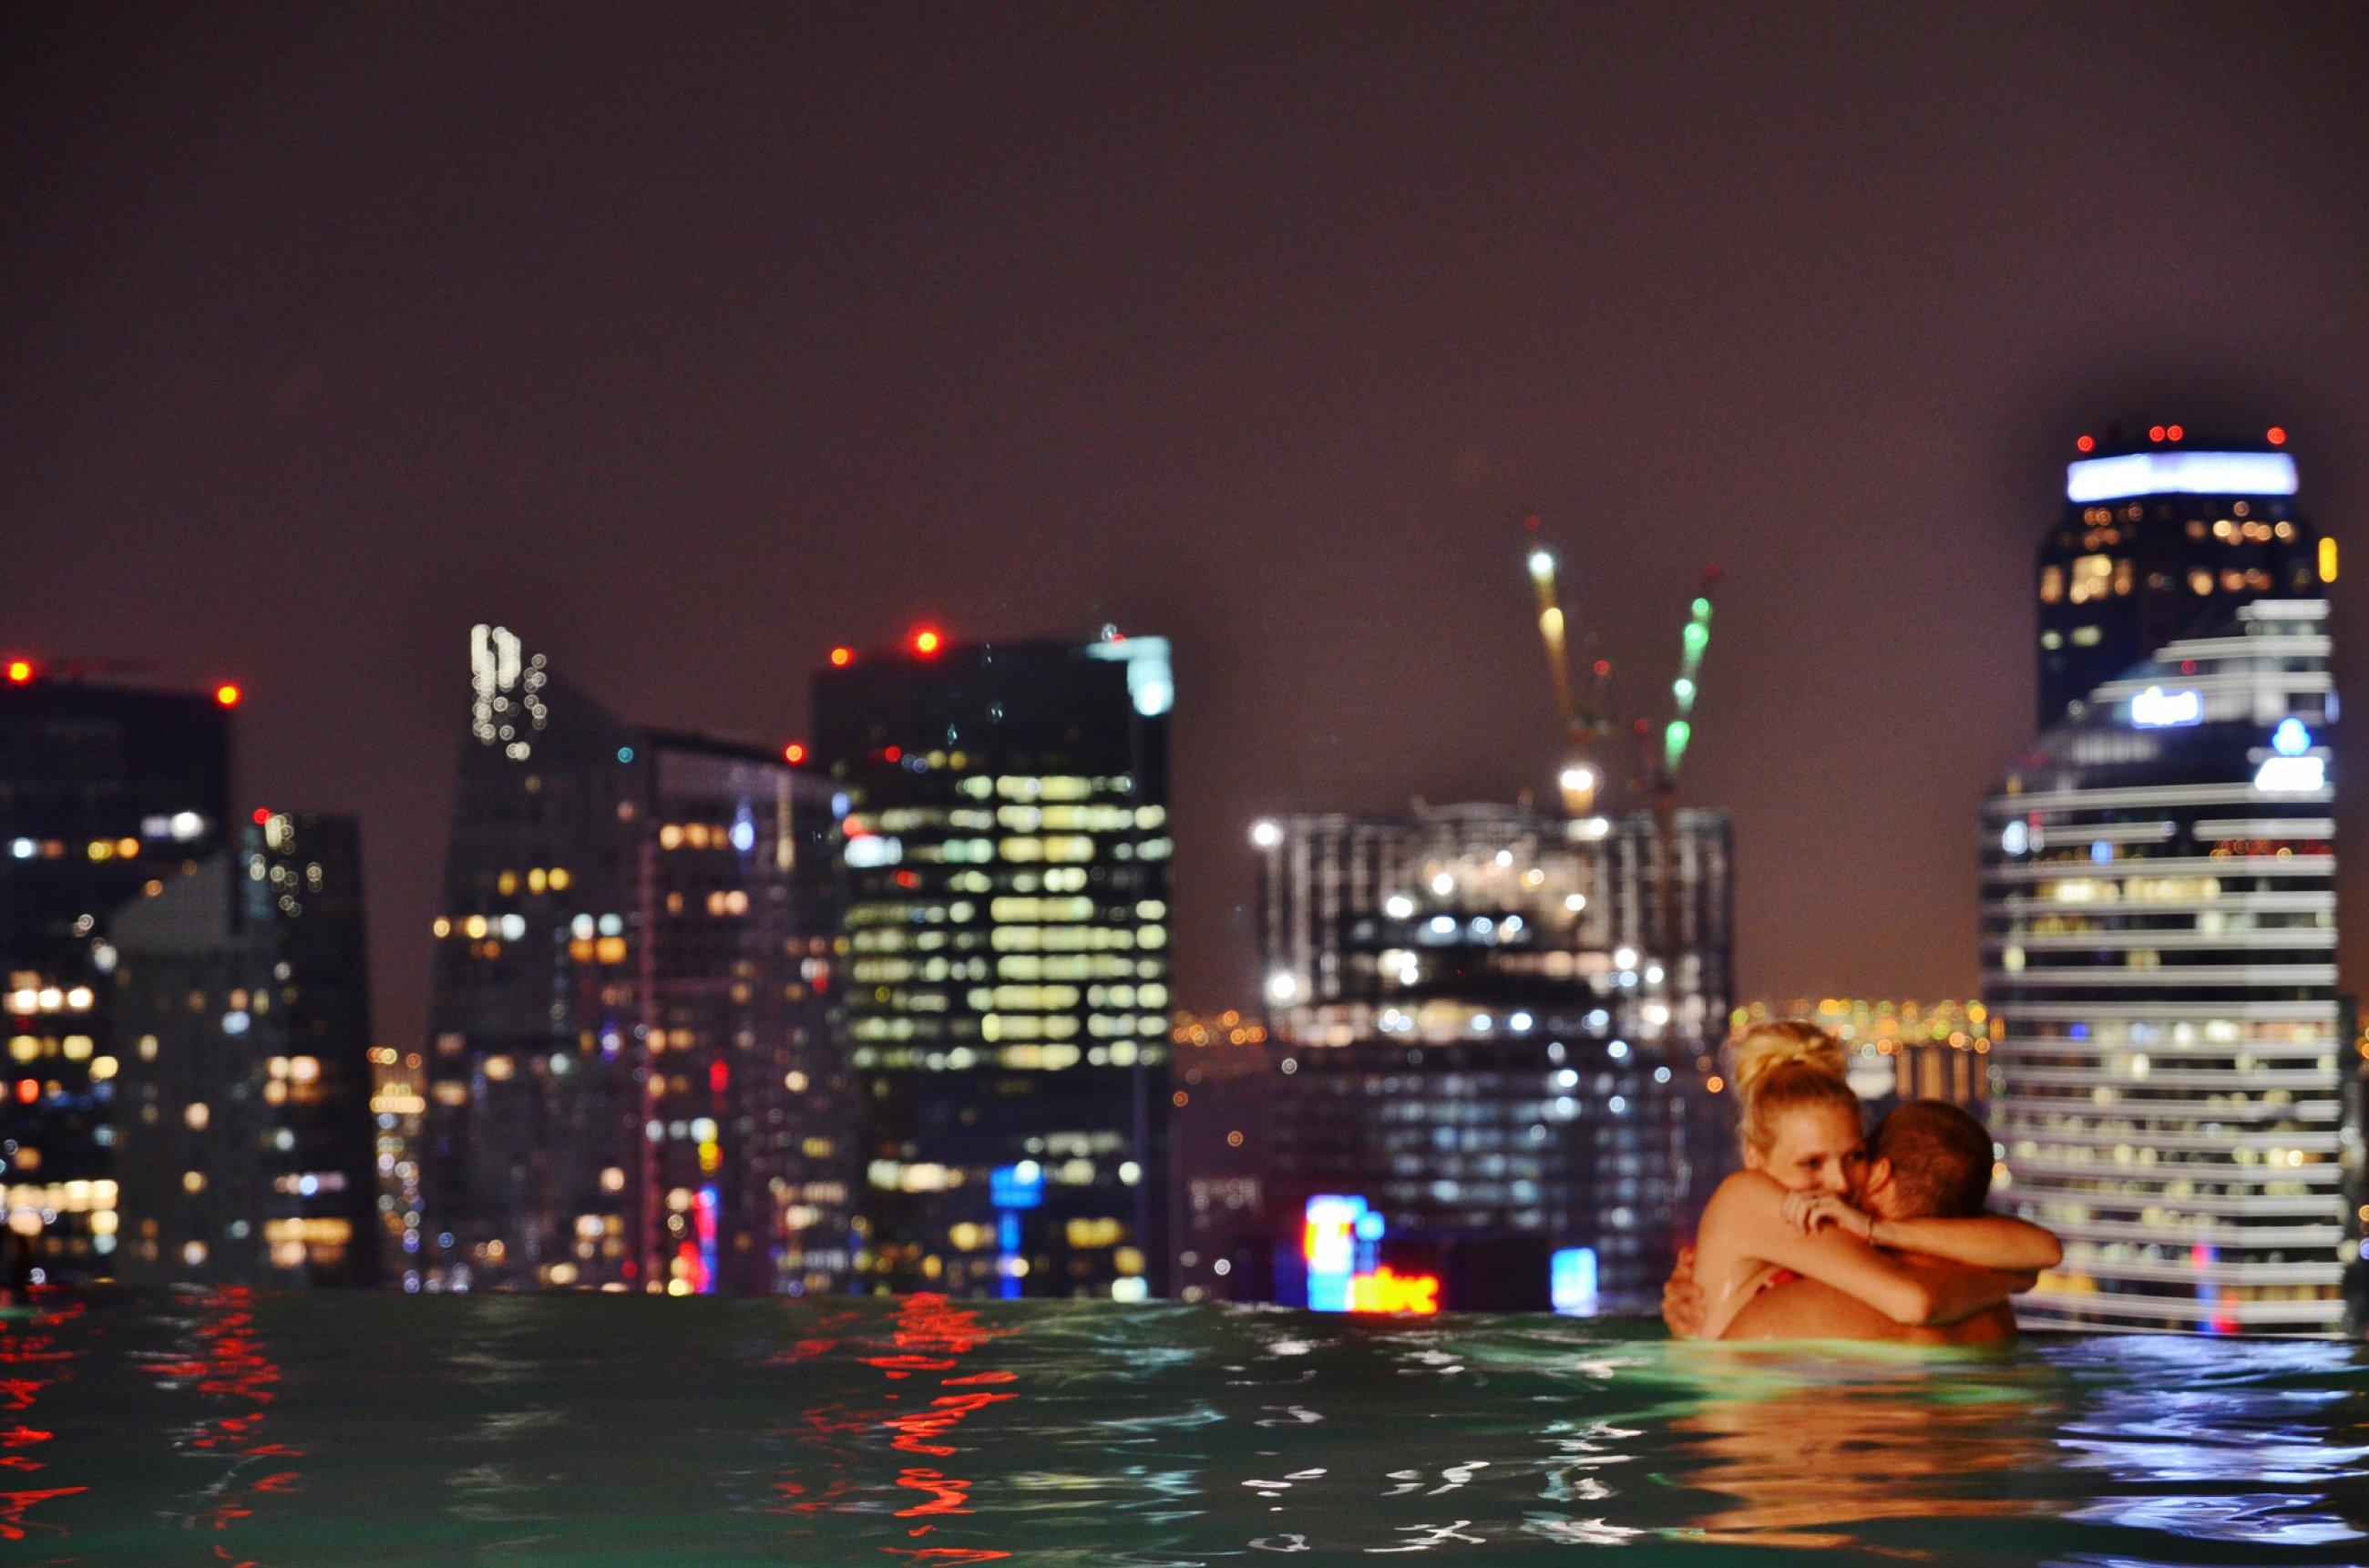 https://bubo.sk/uploads/galleries/5062/sngpr-tms-romantika-v-marina-bay-sands-nad-singapurom-nikoleta-bednarikova-.jpg